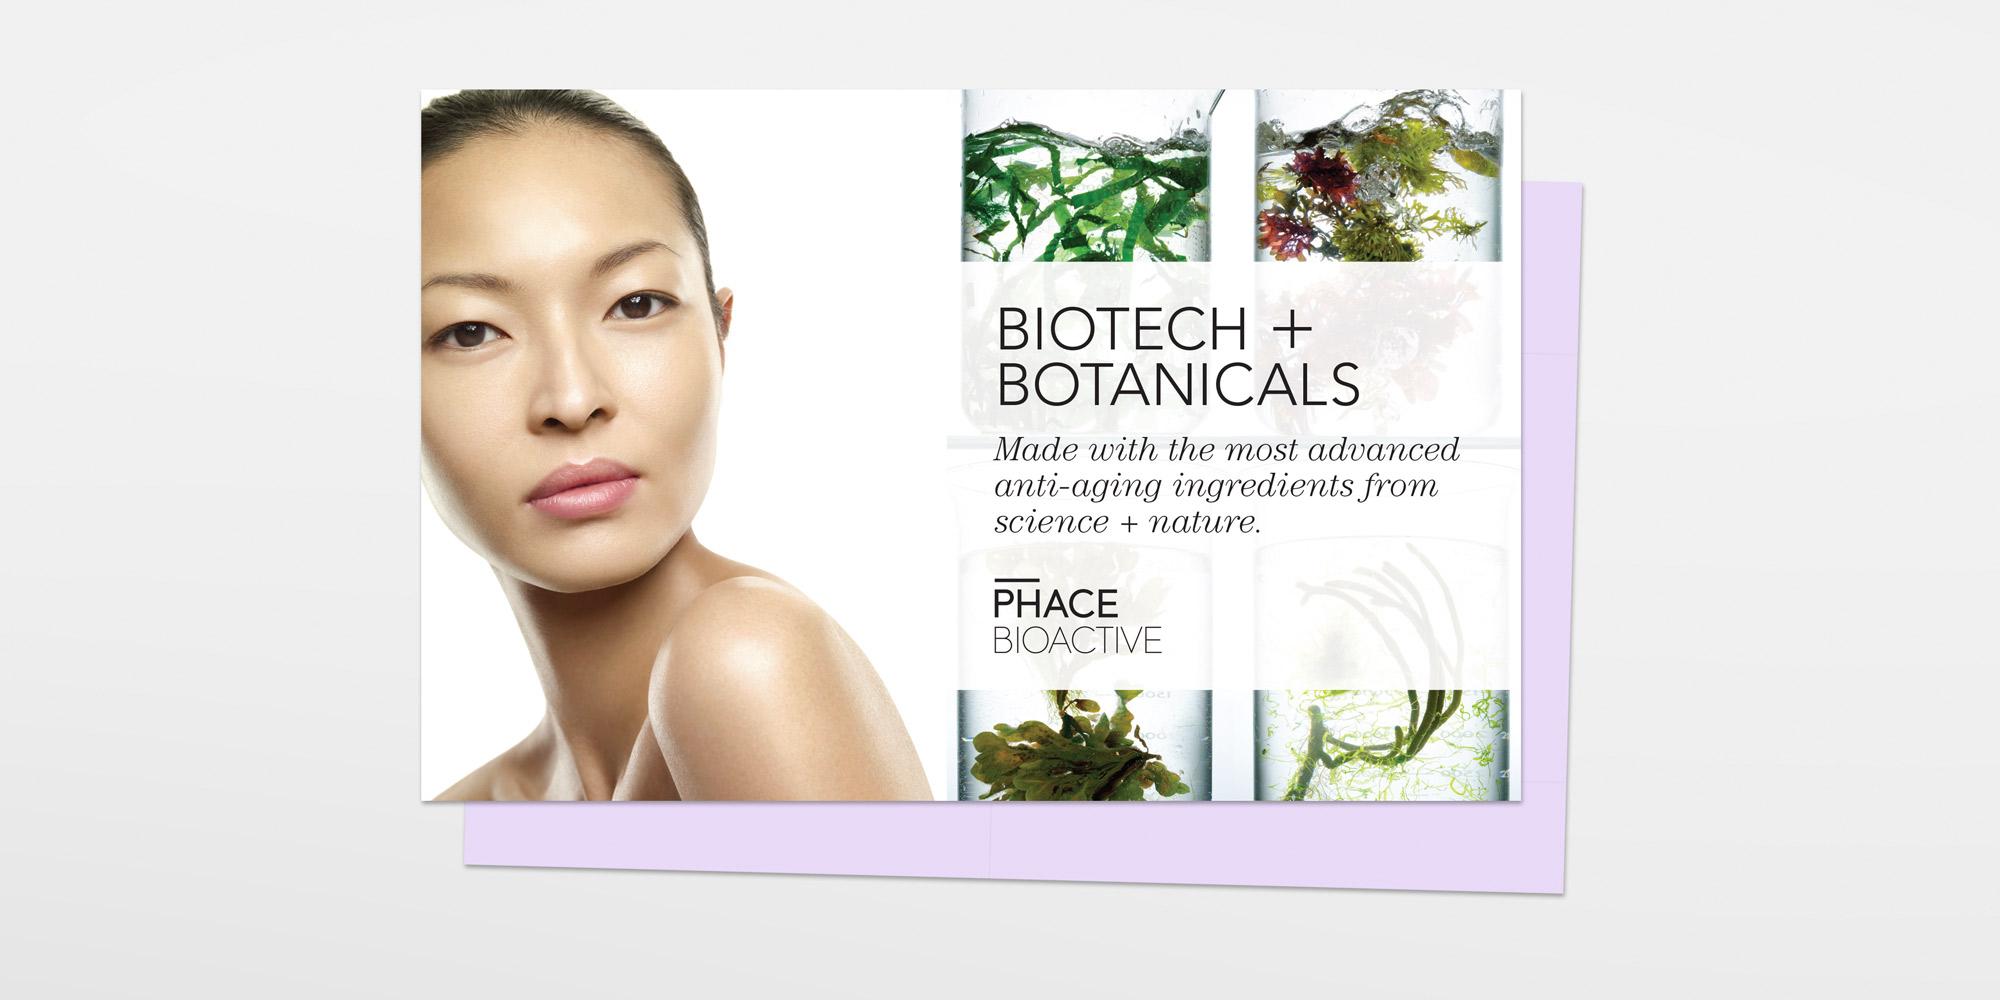 Phace Bioactive Ad